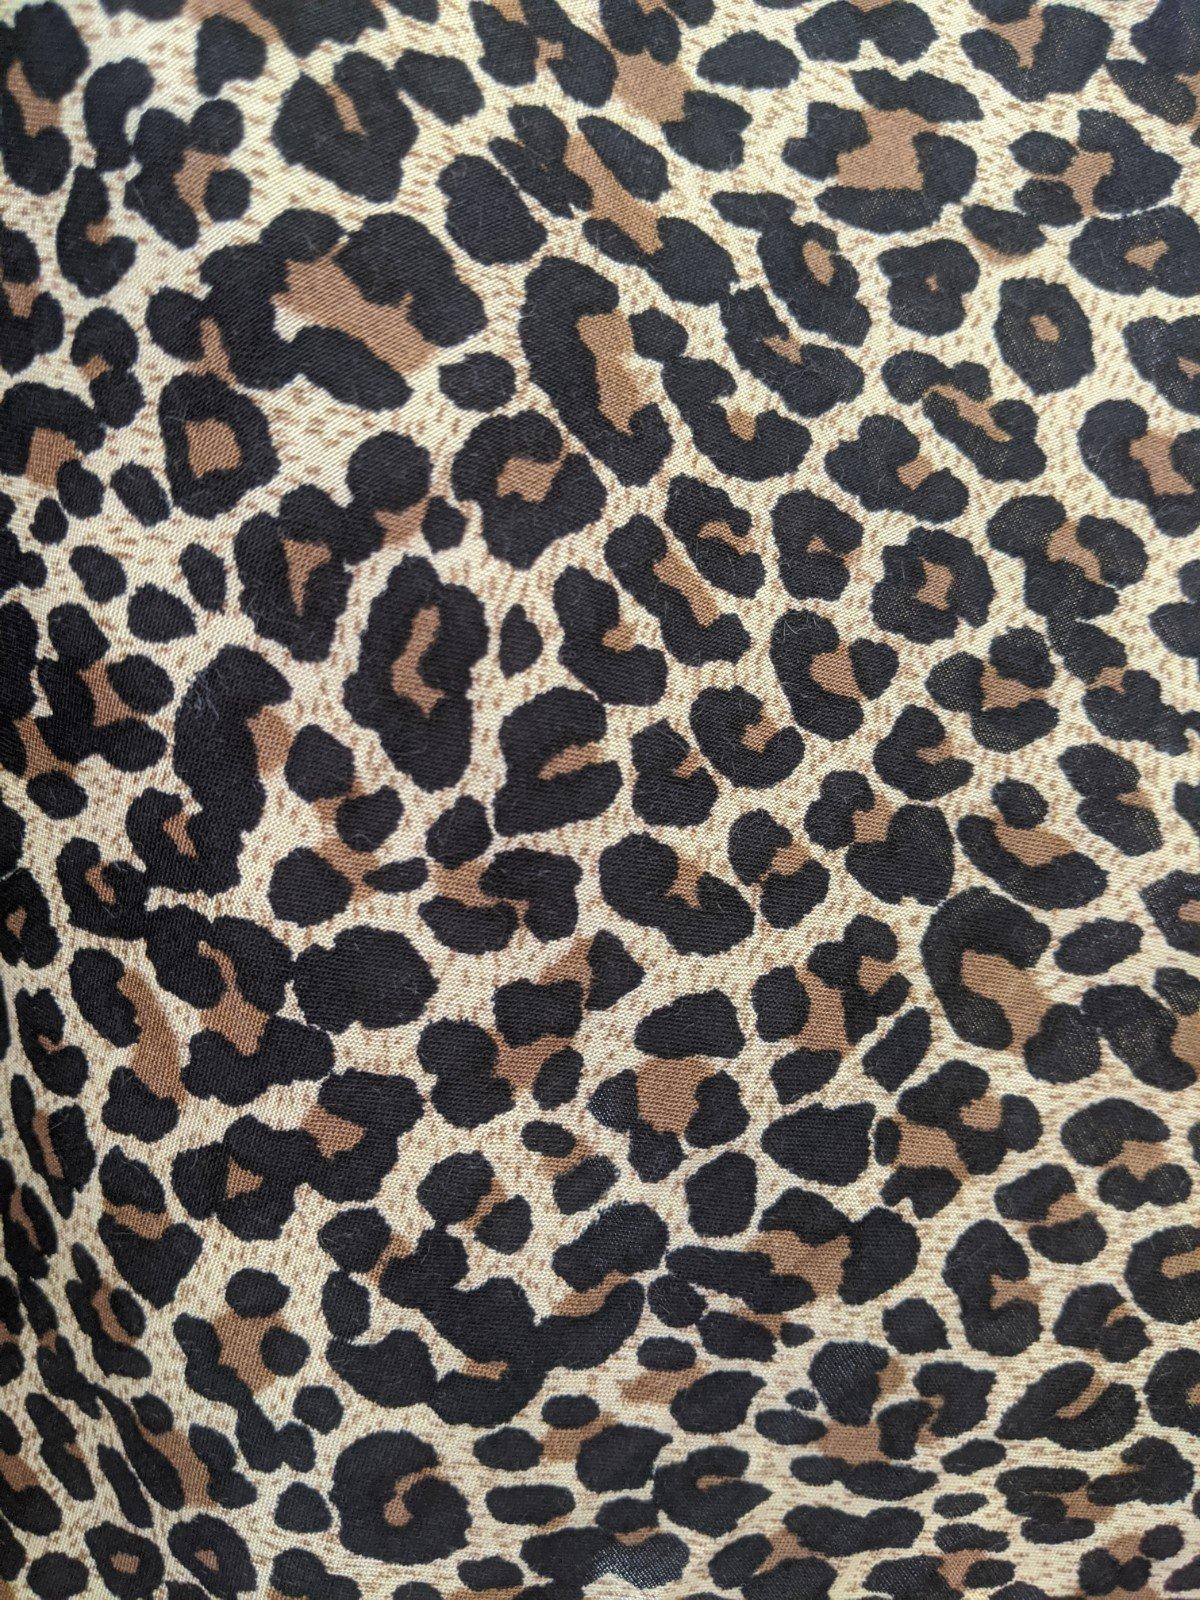 Leopard Print - 100% Rayon